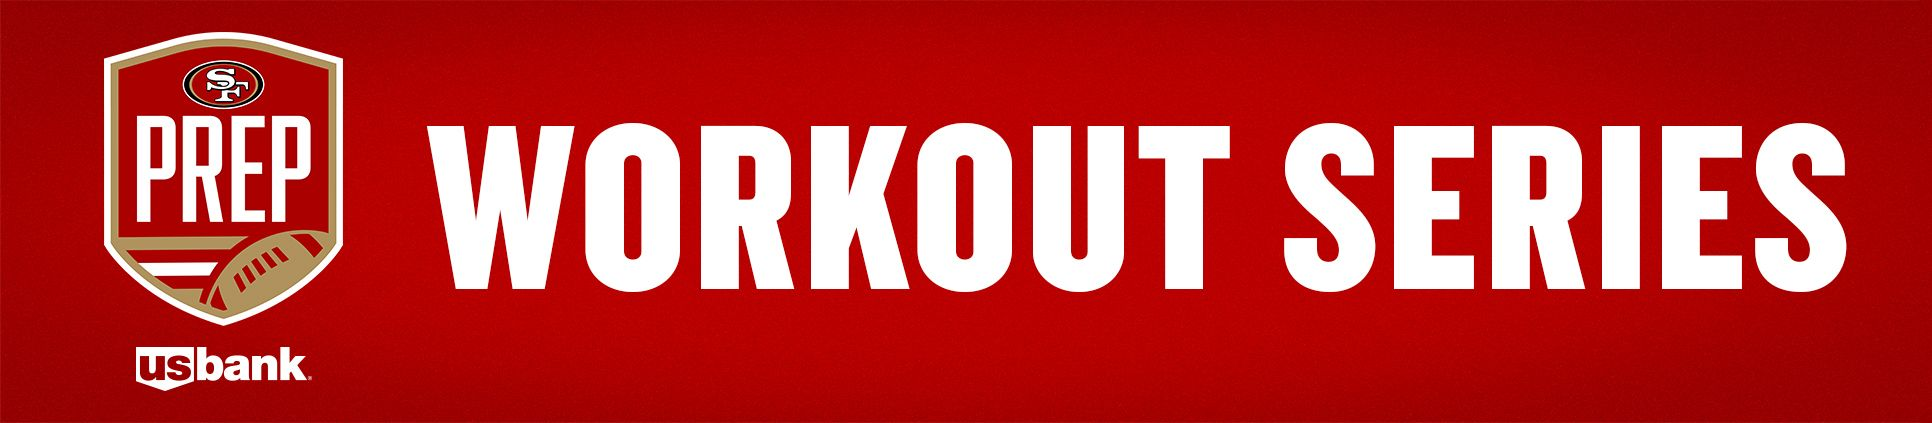 Prep-WorkoutSeries